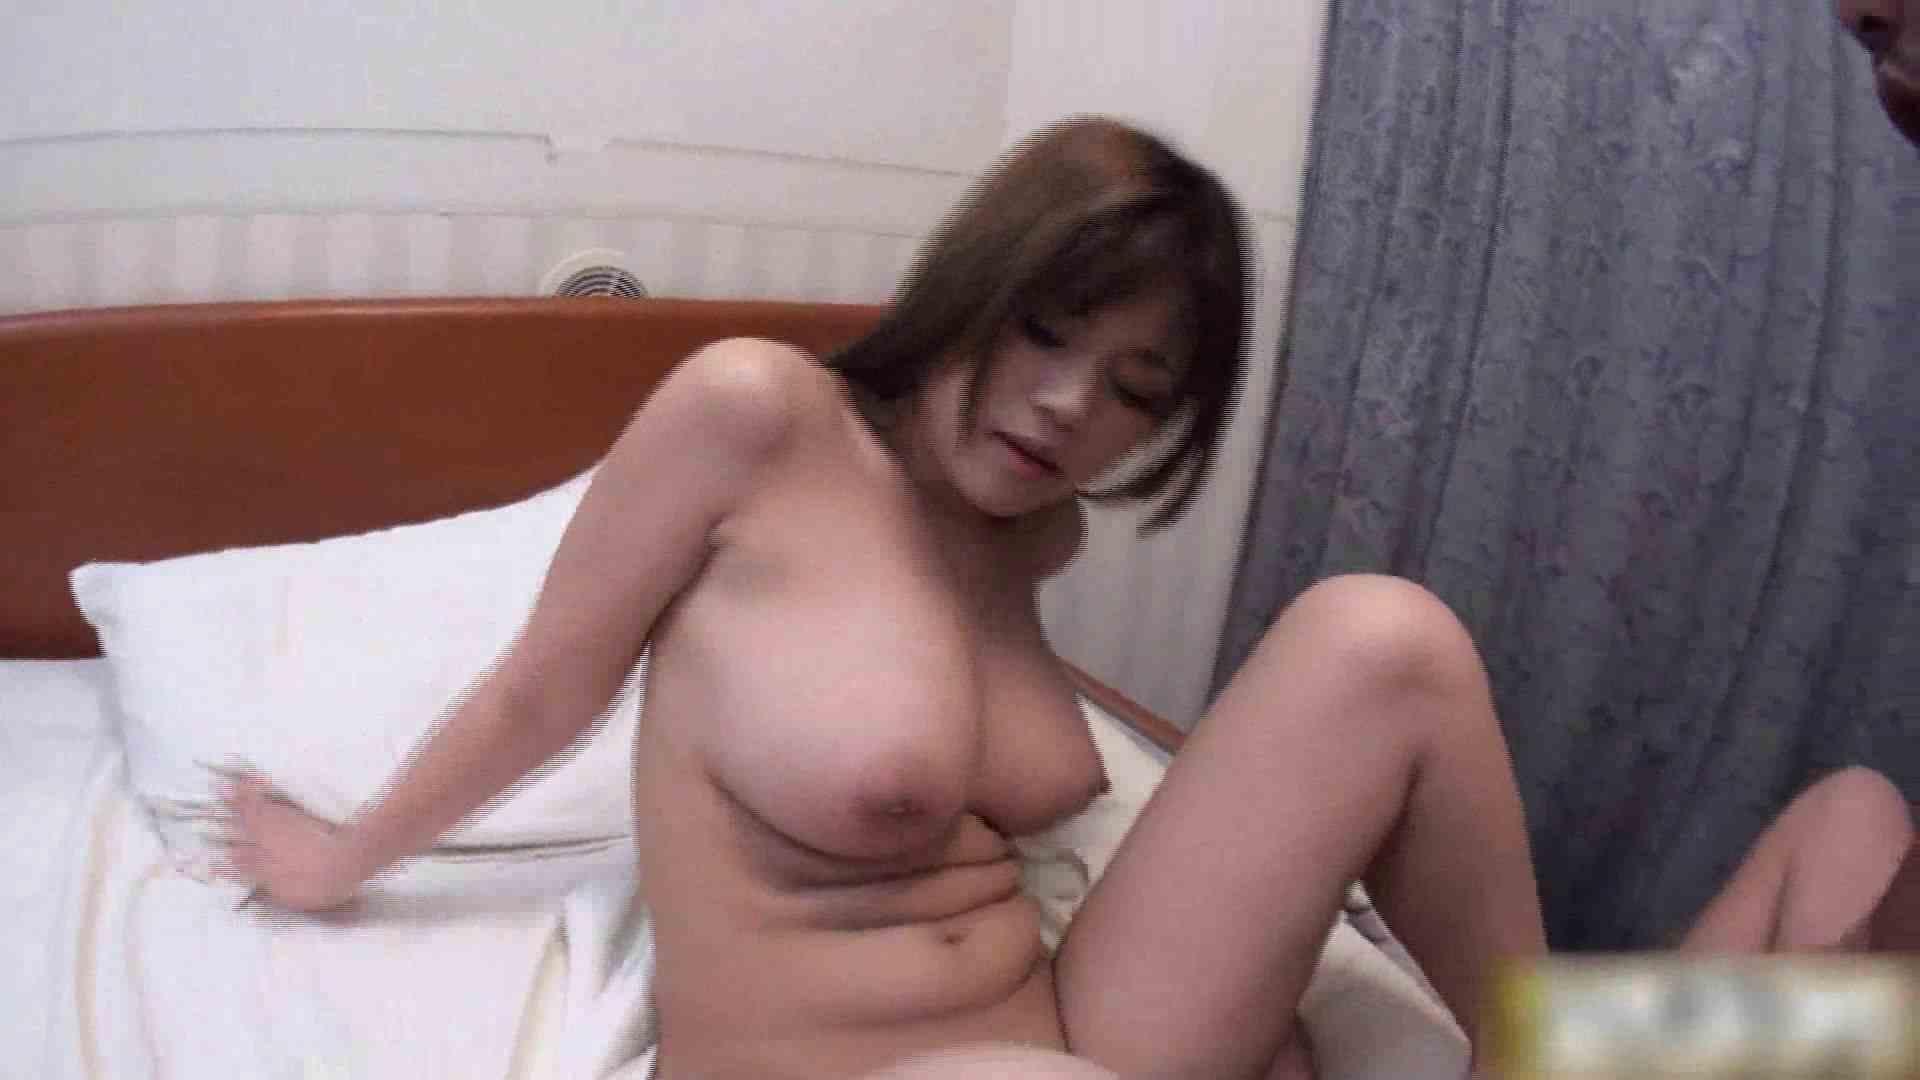 S級厳選美女ビッチガールVol.36 後編 OL  101枚 50